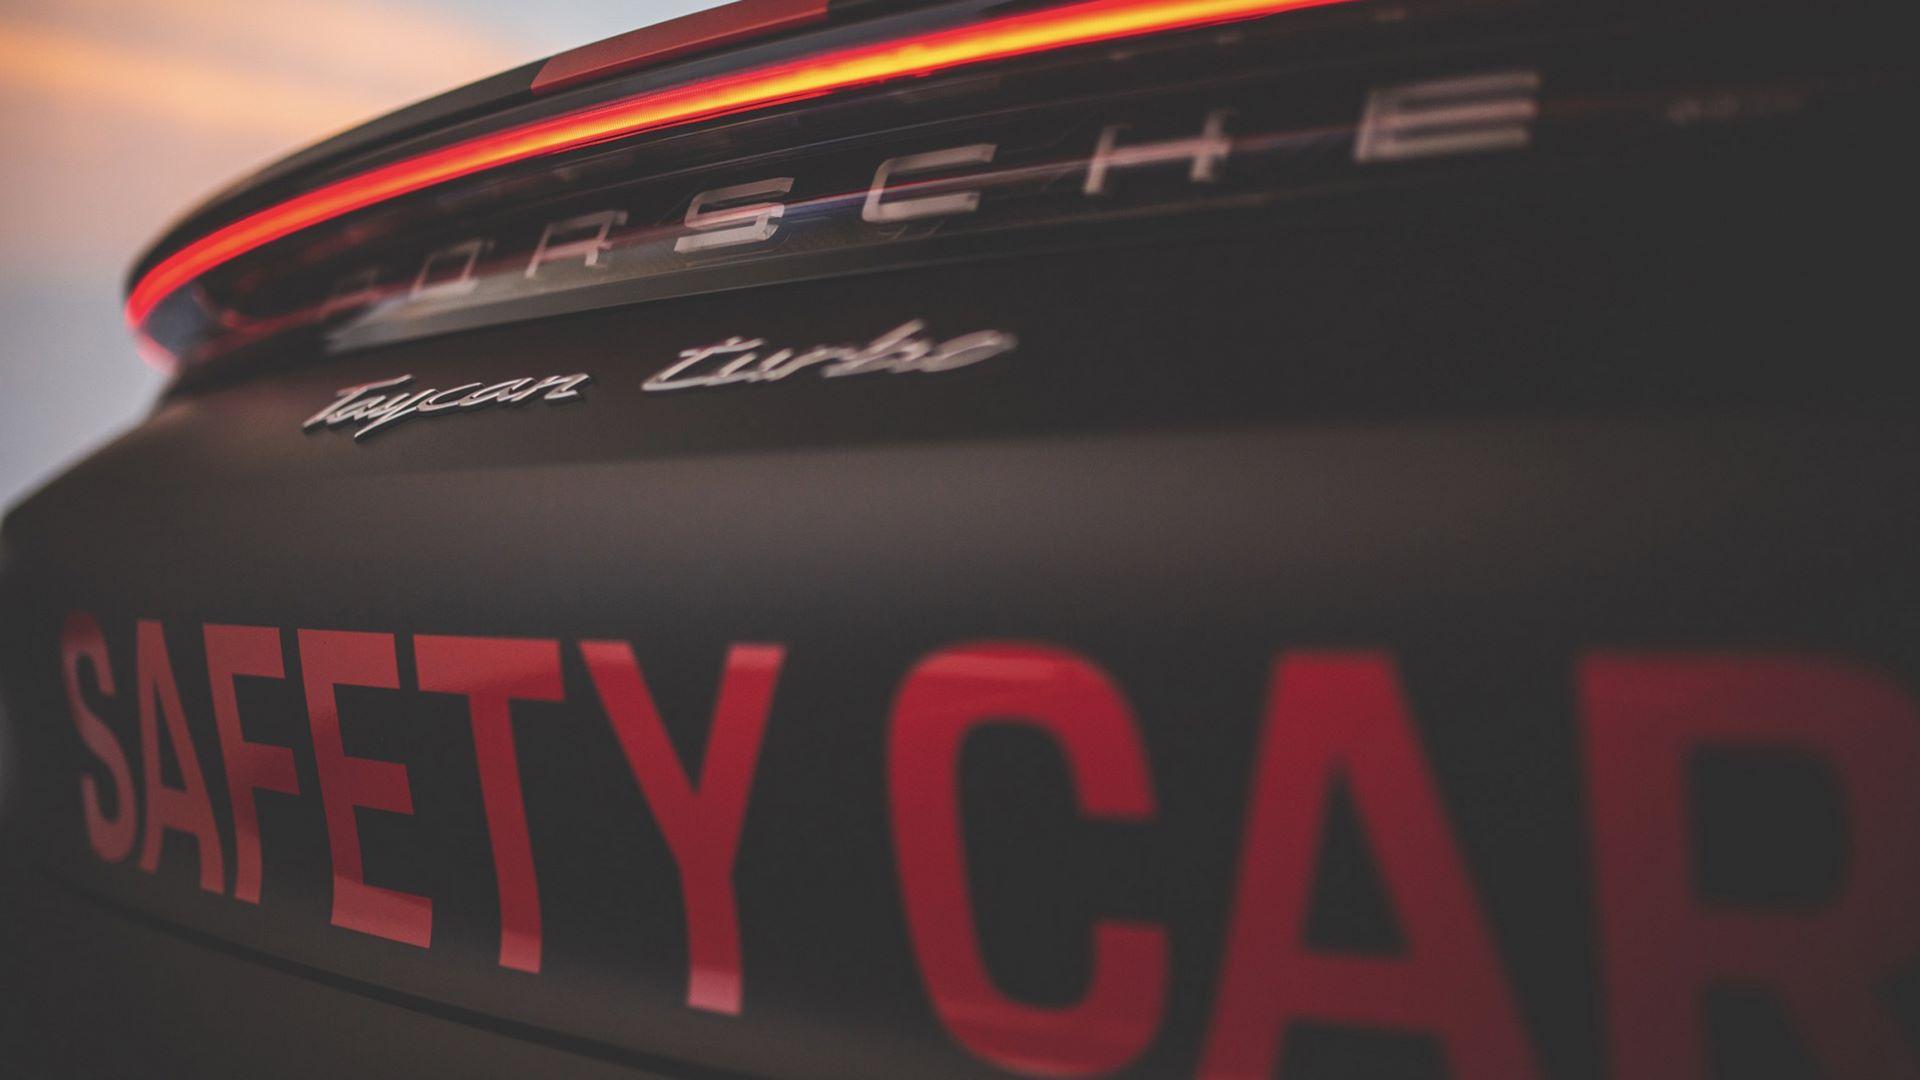 Porsche-Taycan-Turbo-safety-car-Le-Mans-2020-10